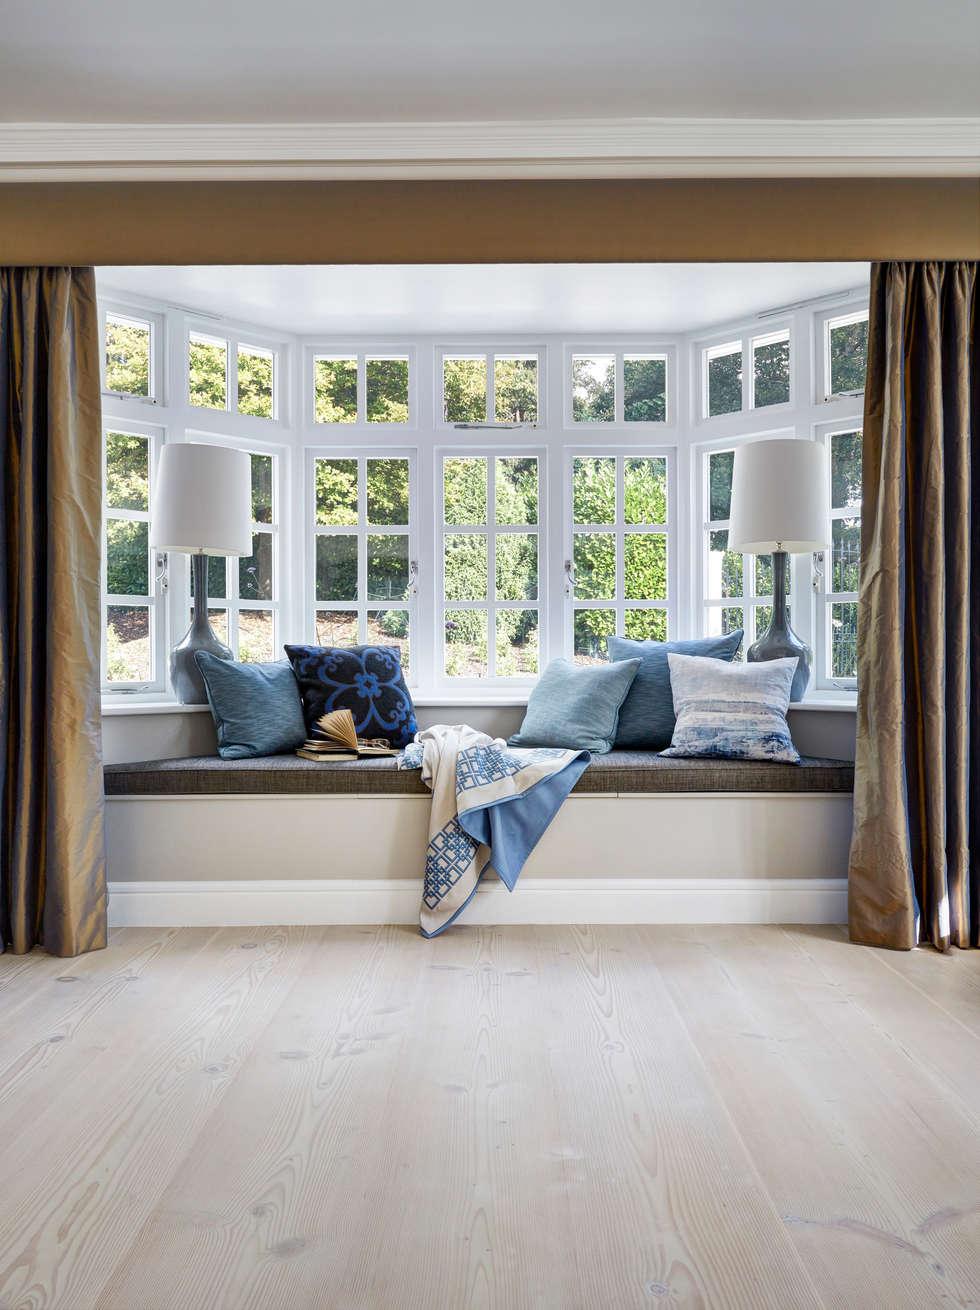 Interior design ideas redecorating remodeling photos for Room design app uk